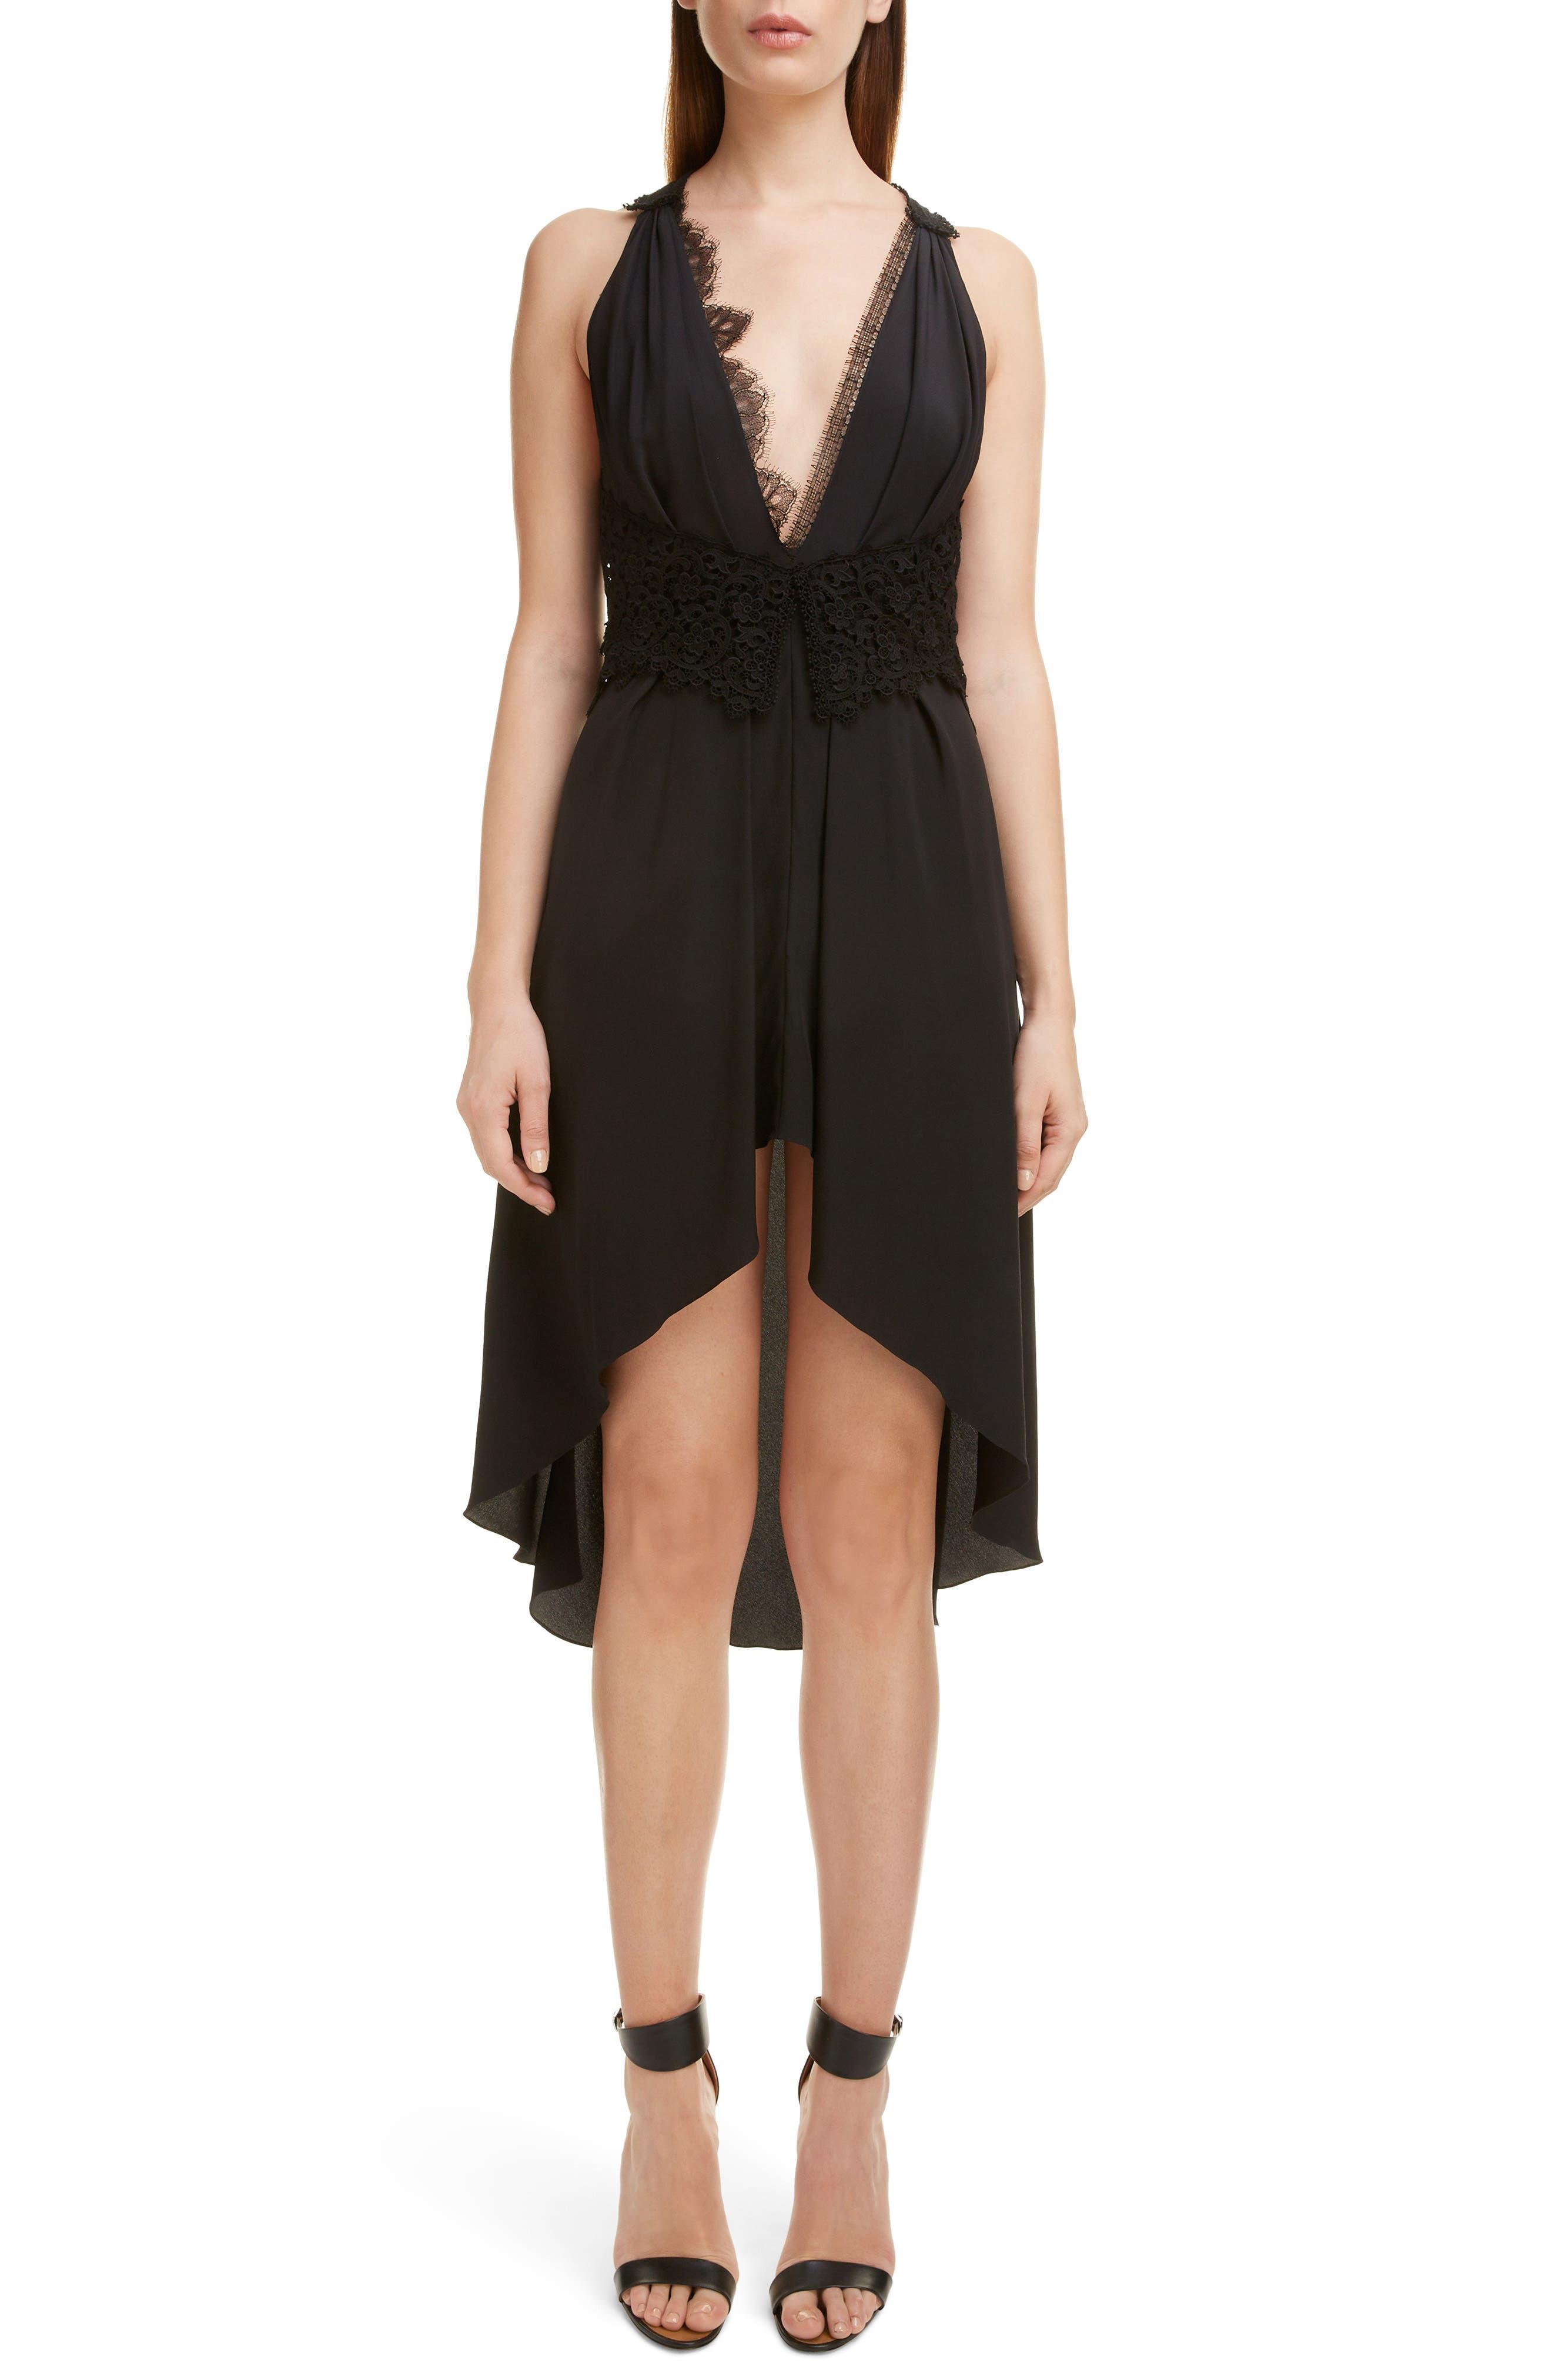 VICTORIA BECKHAM, Mixed Lace Trim High/Low Silk Dress, Alternate thumbnail 6, color, BLACK